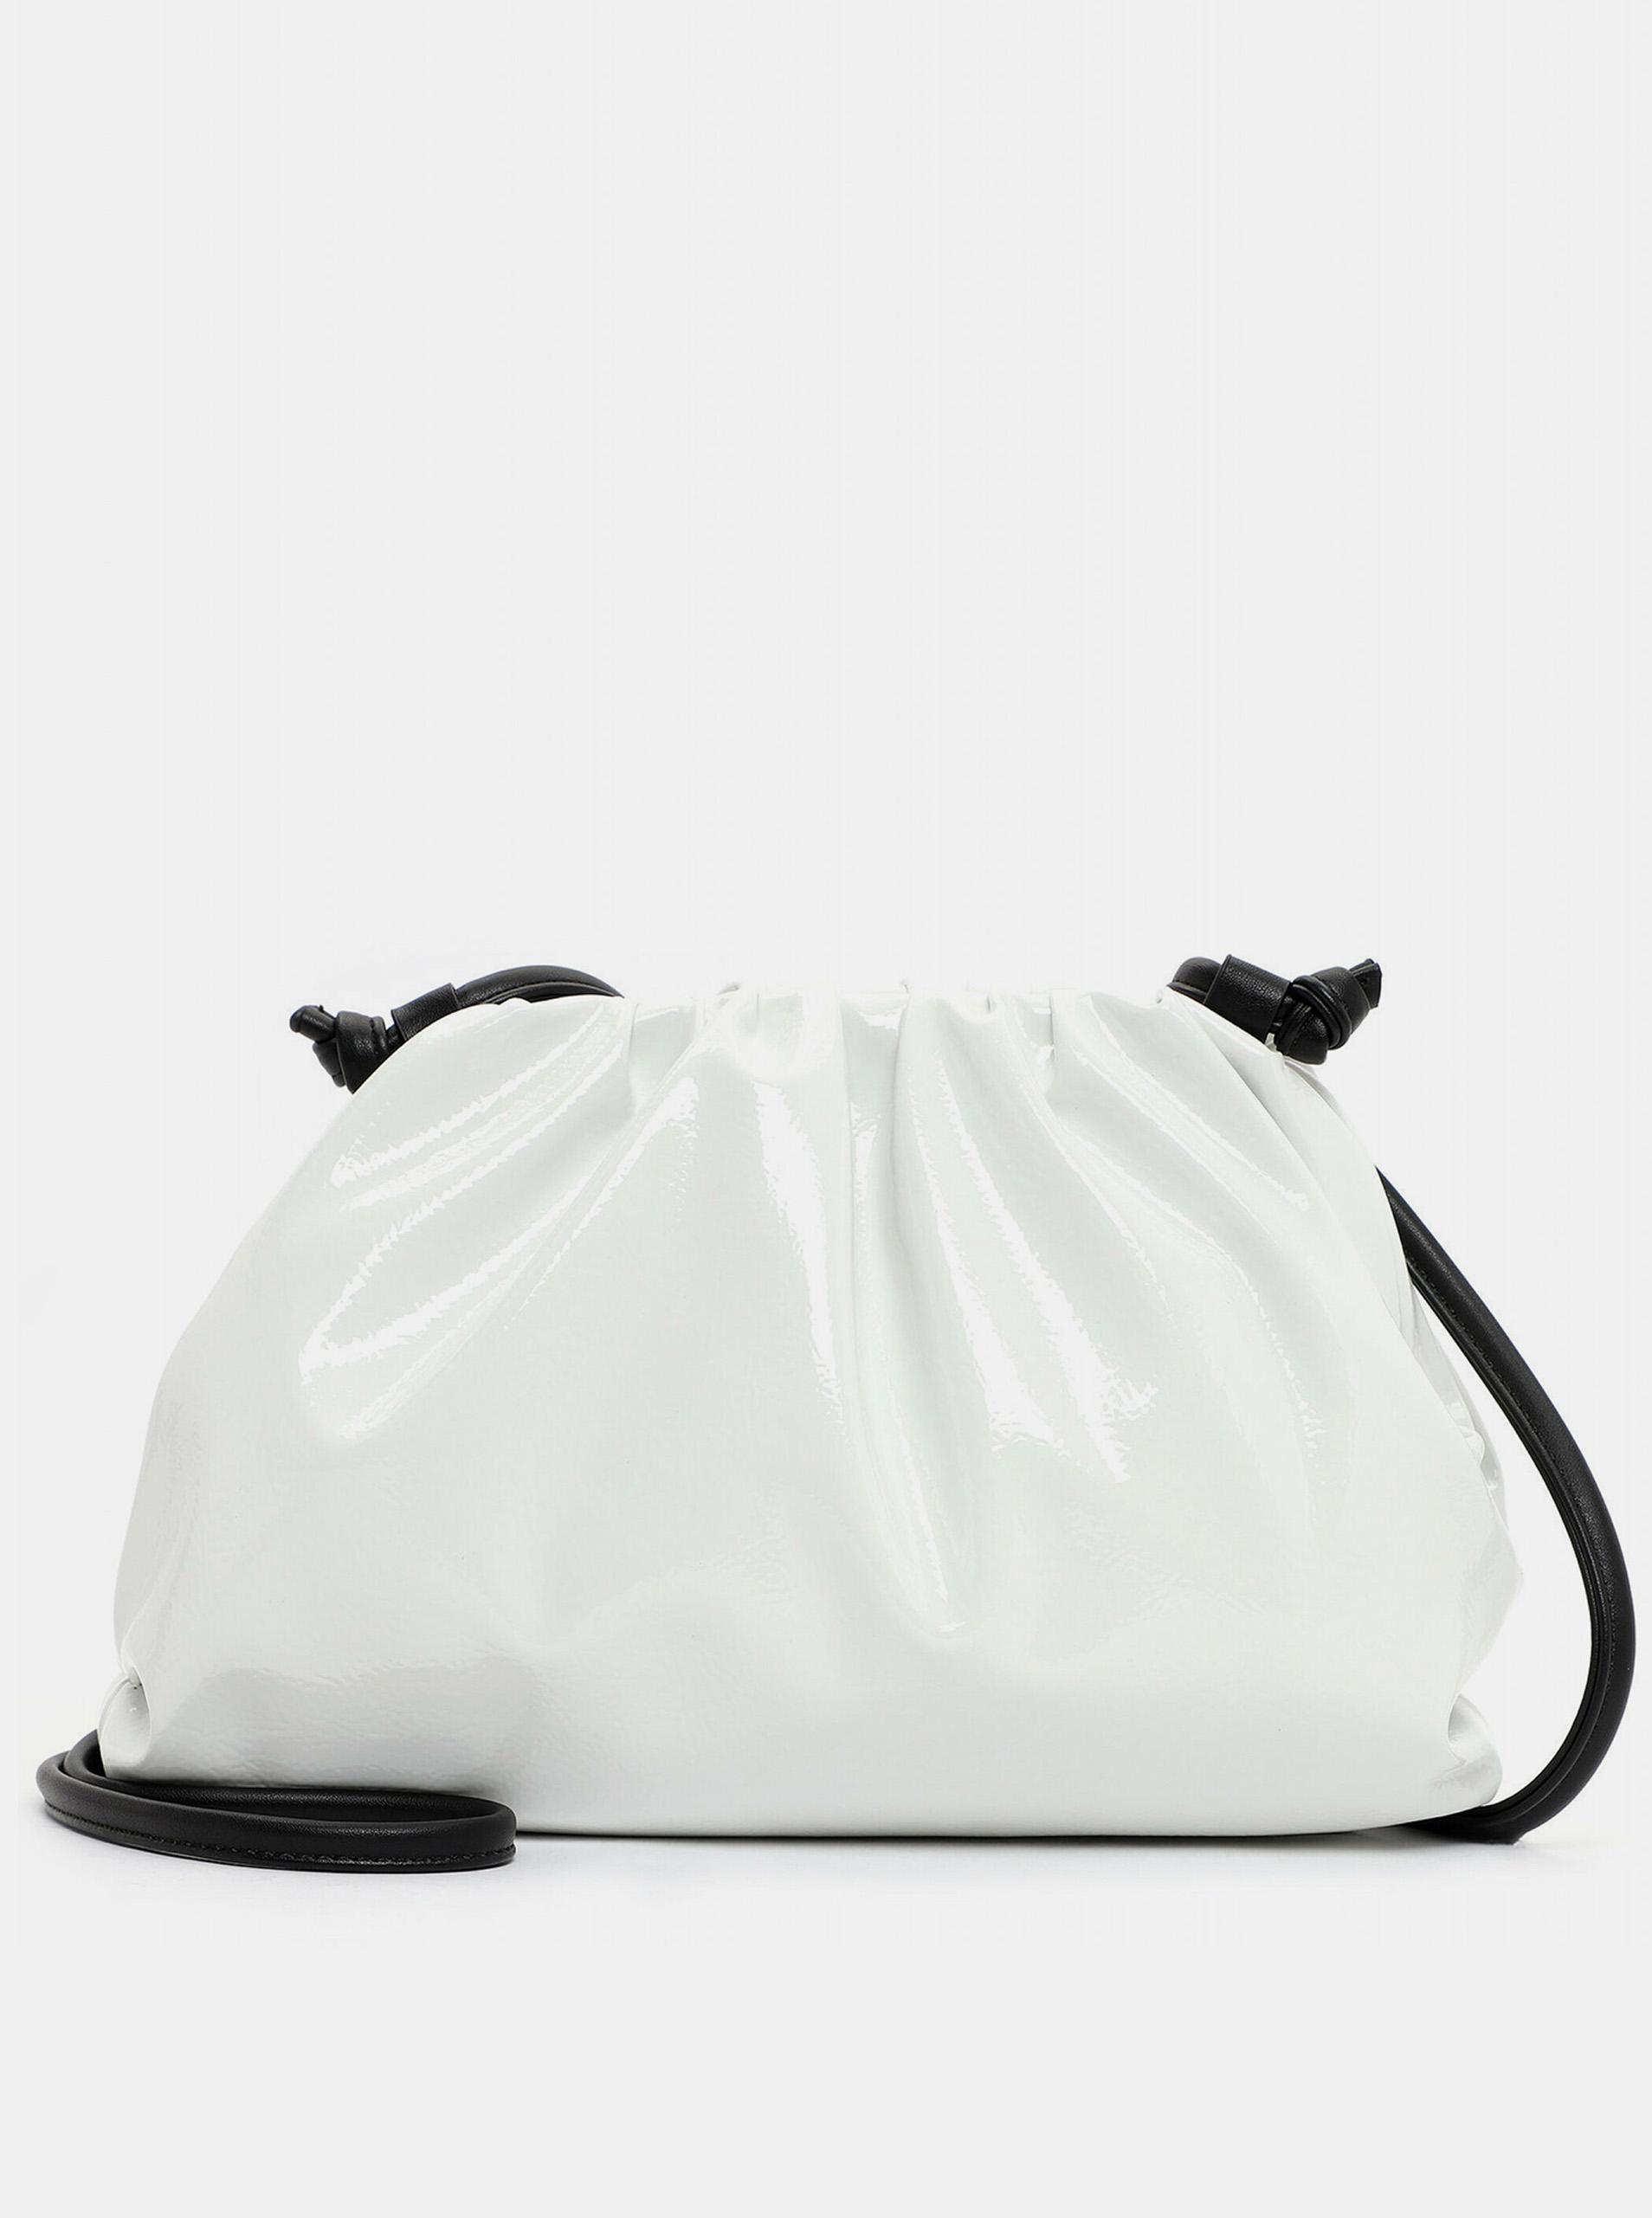 Tamaris bianco crossbody piccola borsetta